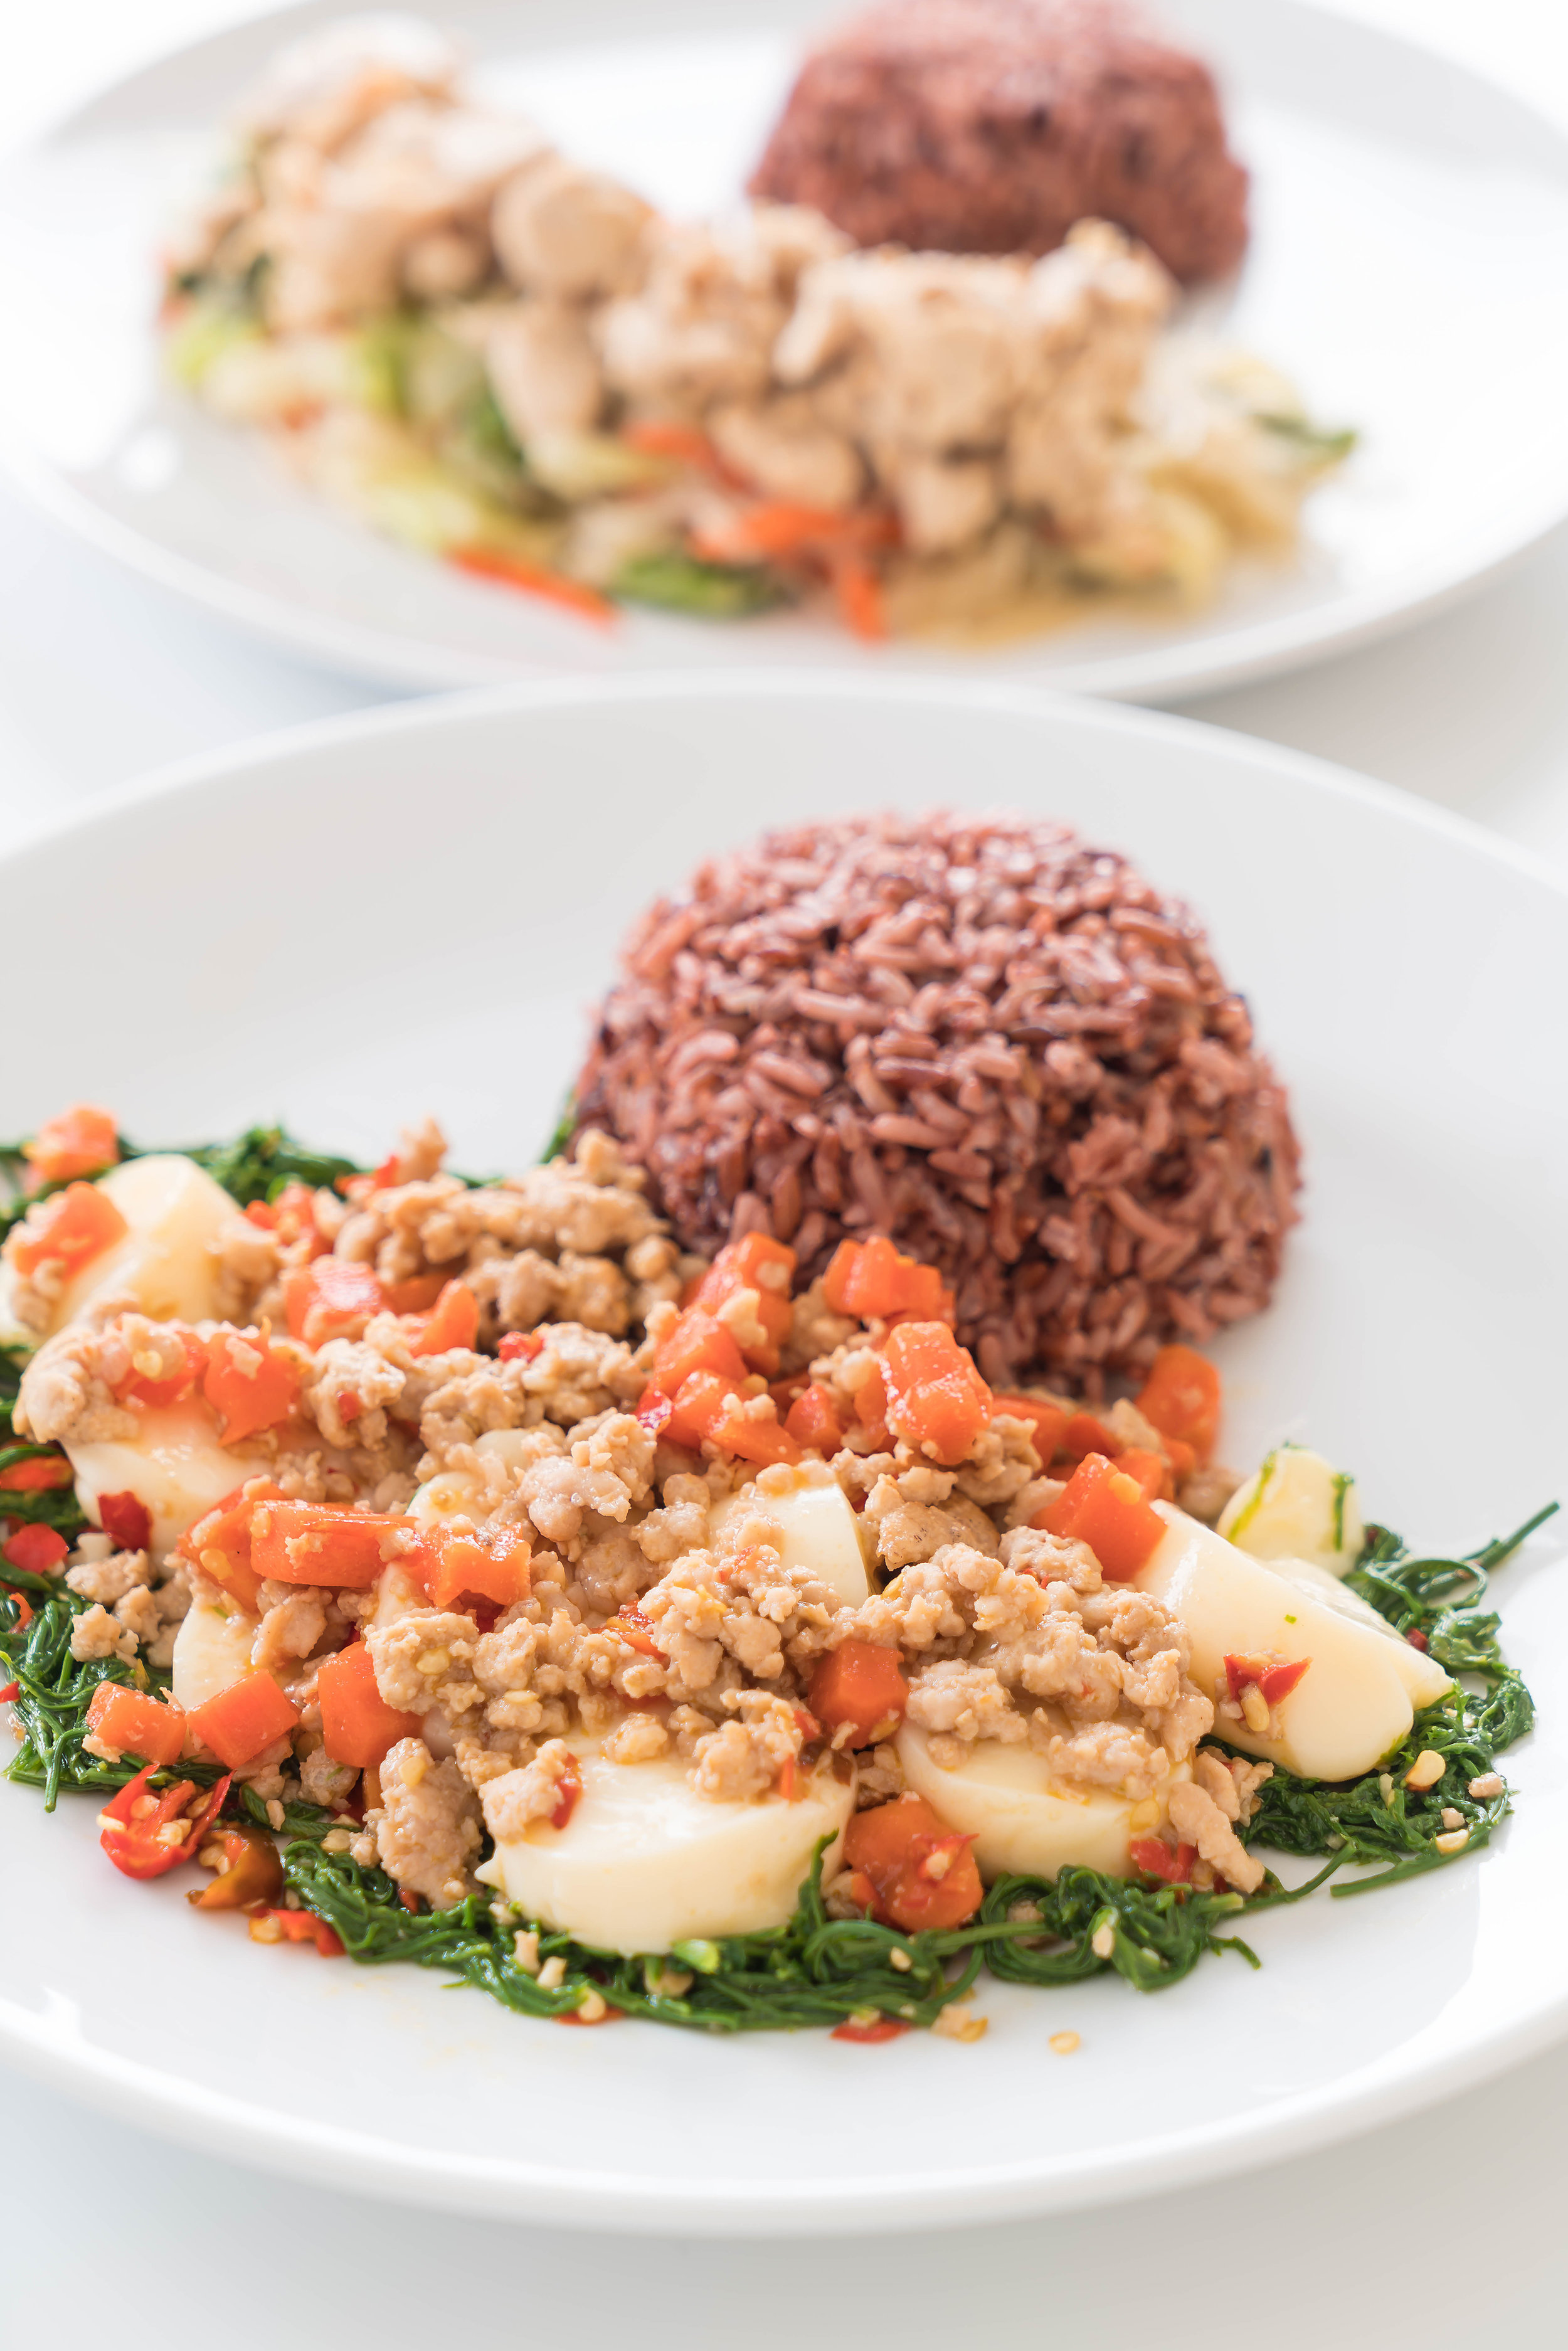 stir-fried-tofu-climbing-wattle-minced-pork-and-soya-bean-with-berry-rice.jpg